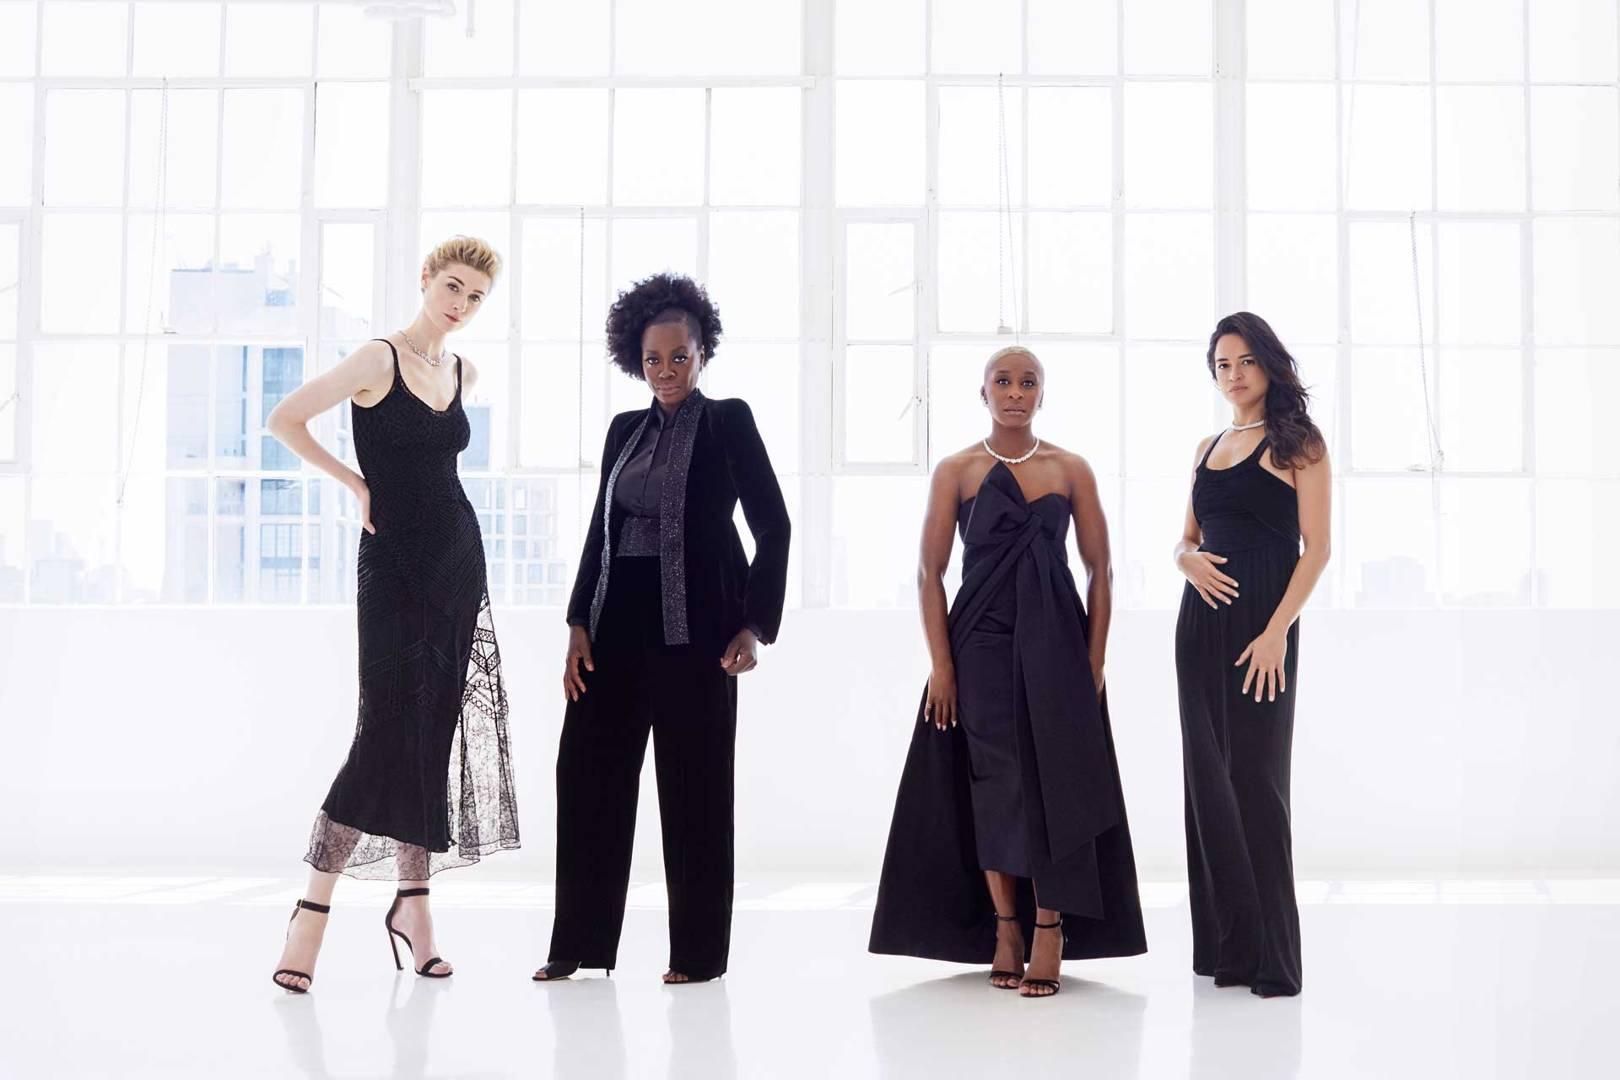 Elizabeth Debicki, Viola Davis, Cynthia Erivo and Michelle Rodriguez - Vogue Photoshoot - 2018